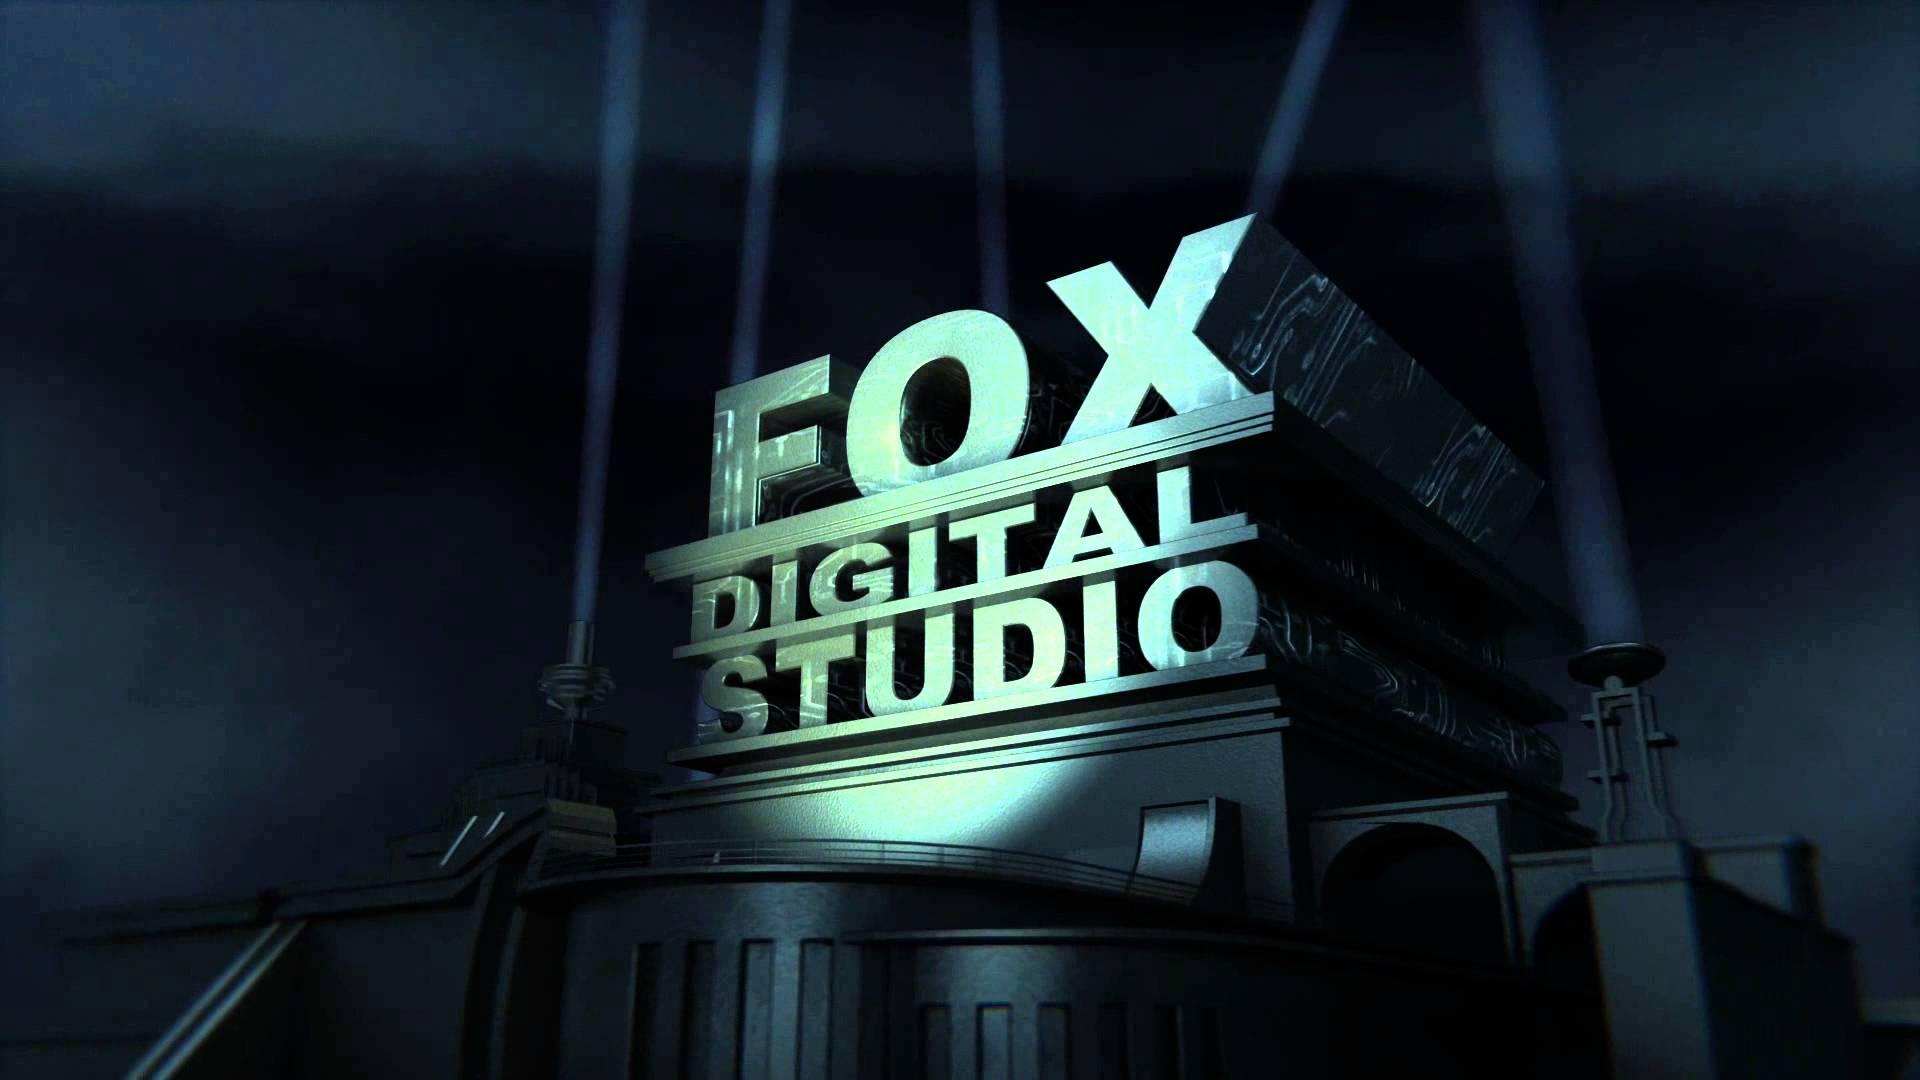 Fox Digital Studio New Logo